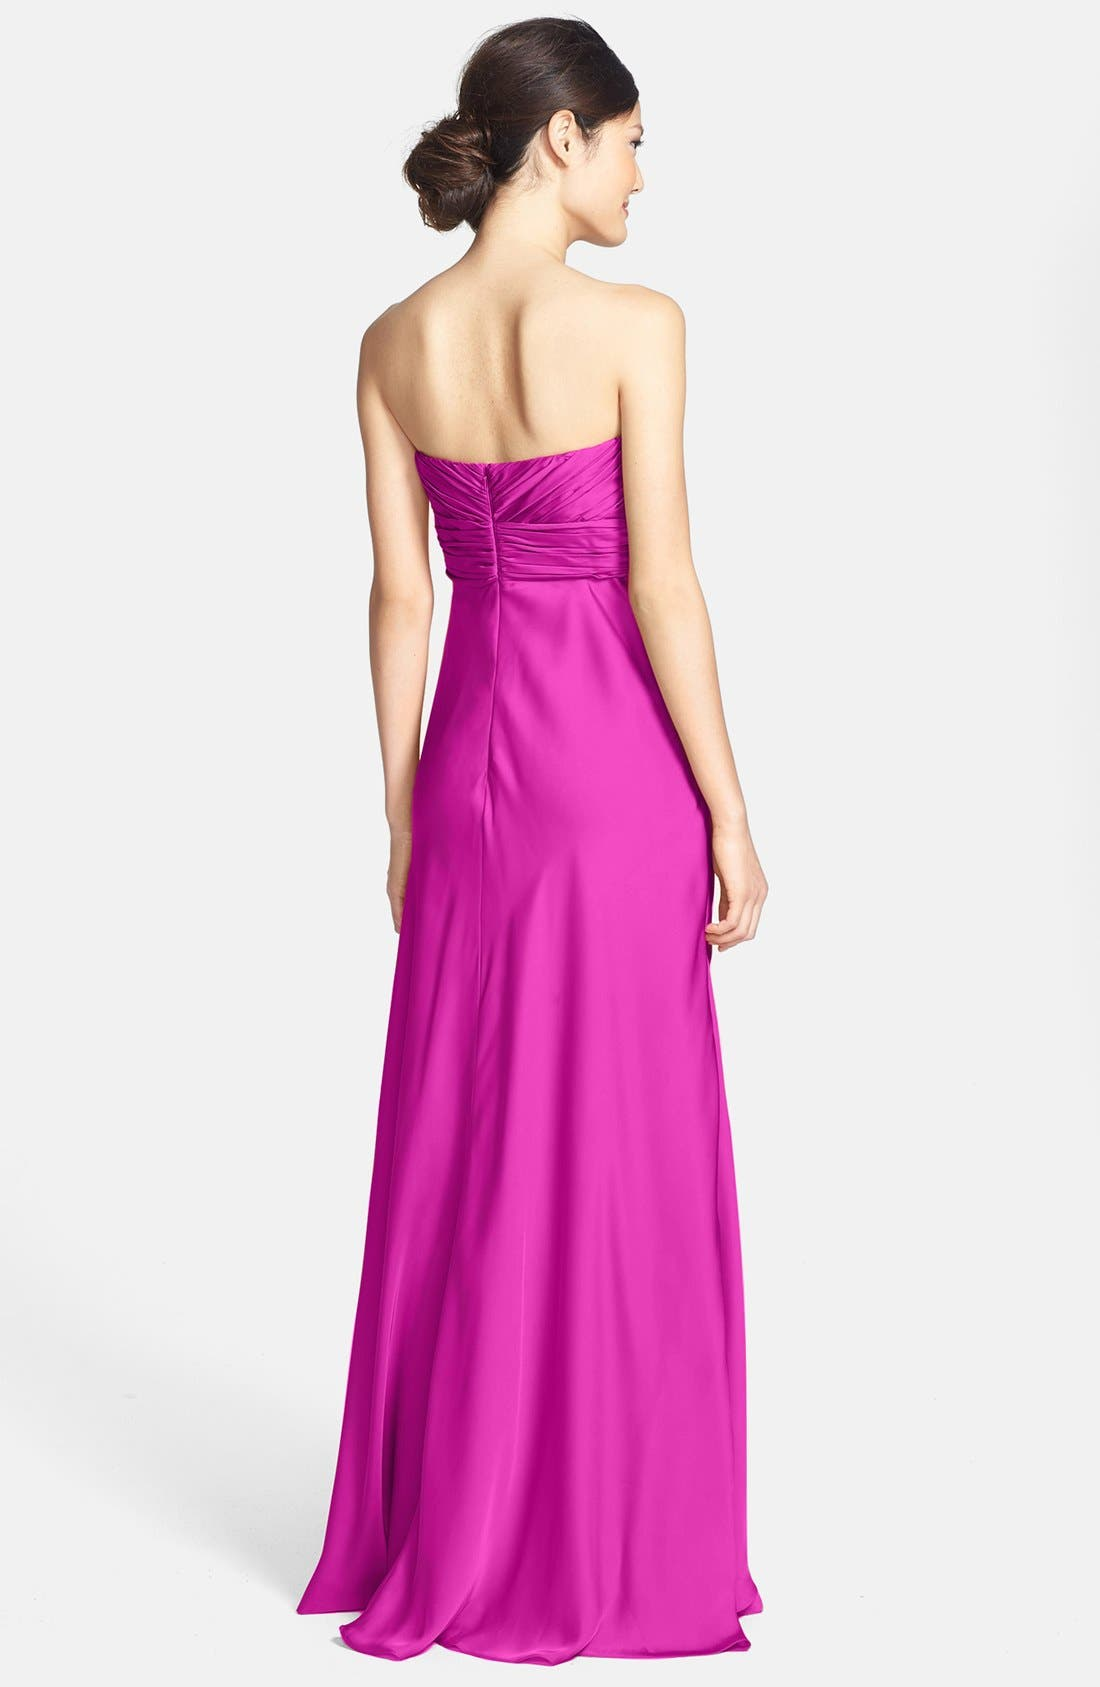 Alternate Image 2  - ML Monique Lhuillier Bridesmaids Strapless Gown (Nordstrom Exclusive)